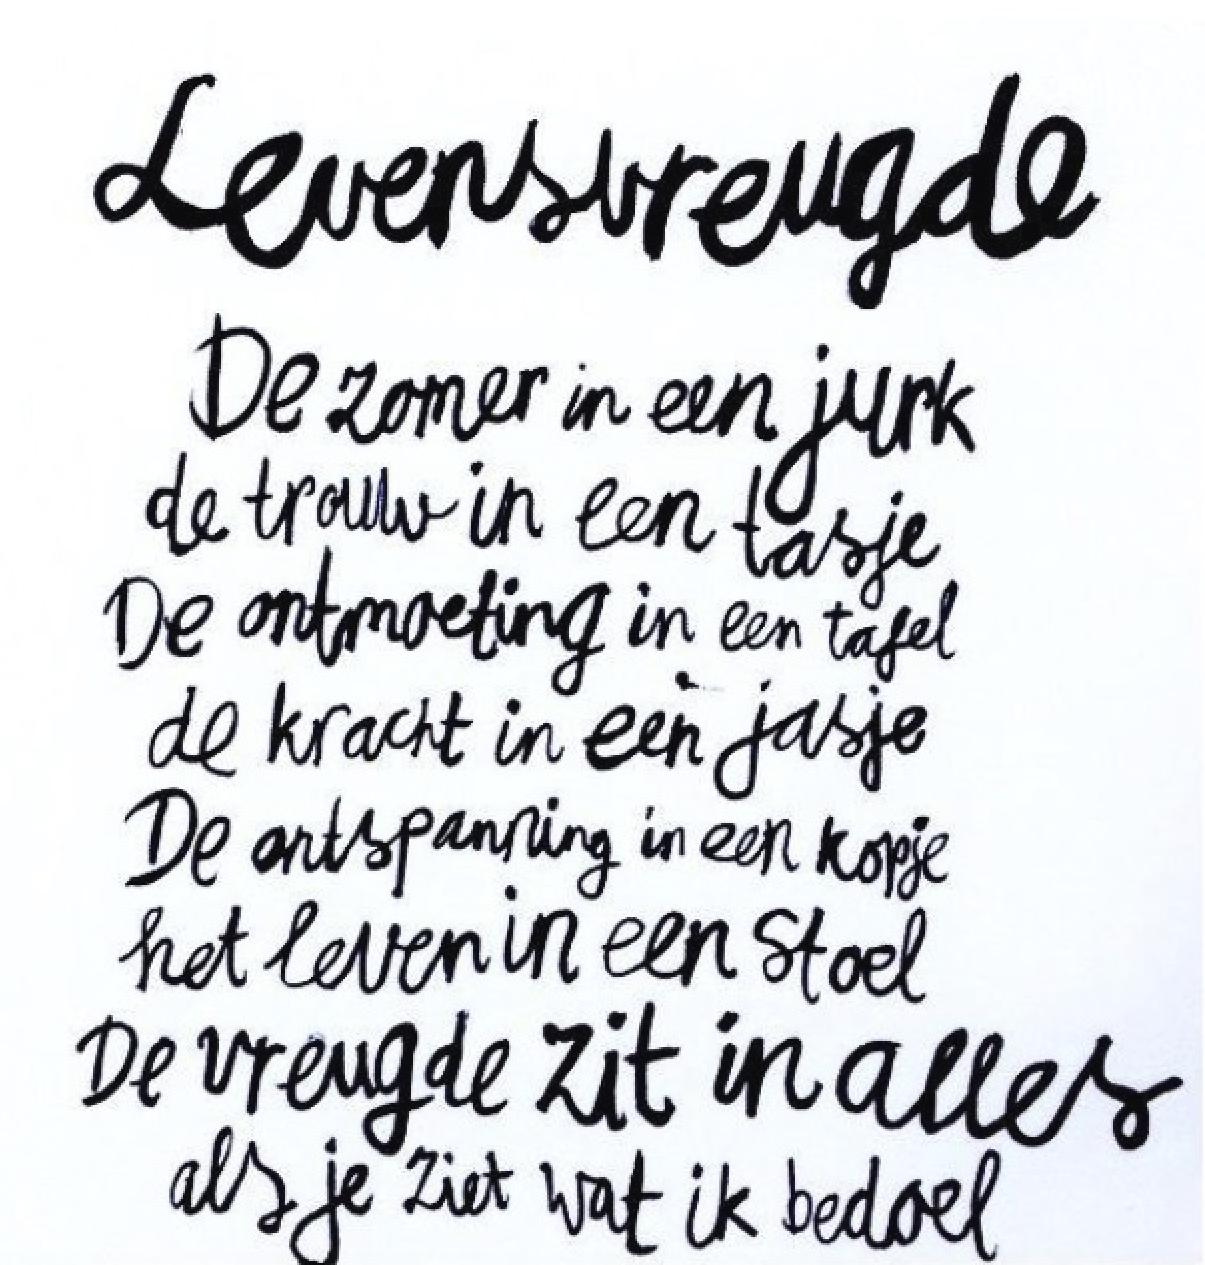 Amsterdam Quotes Pinnatalie Beerepoot On Spreuken  Pinterest  Life Hacks